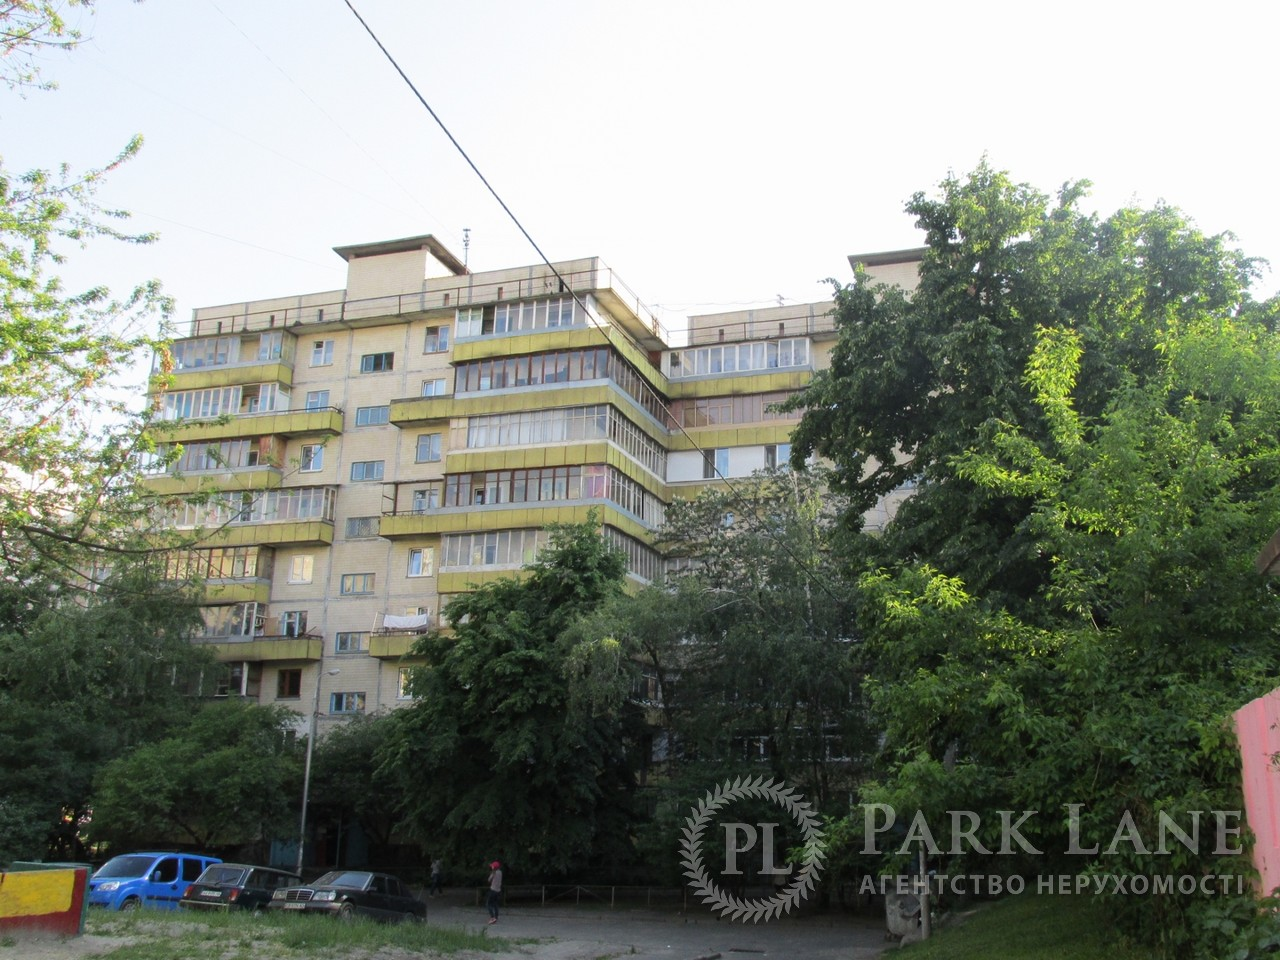 Квартира ул. Тростянецкая, 8в, Киев, Z-378422 - Фото 11